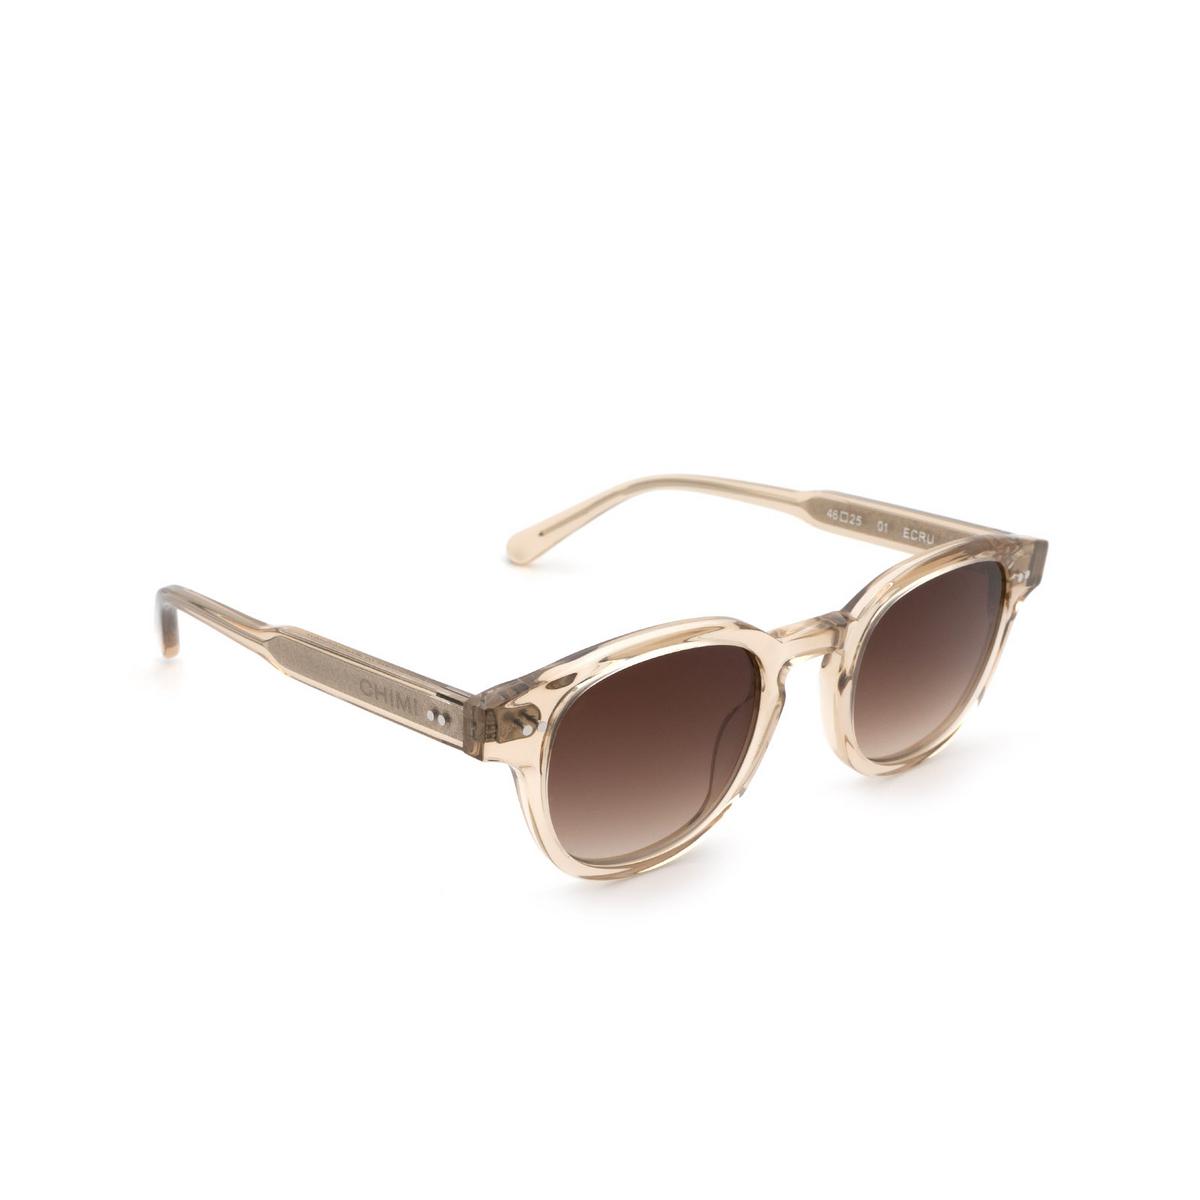 Chimi® Square Sunglasses: 01 color Ecru - three-quarters view.